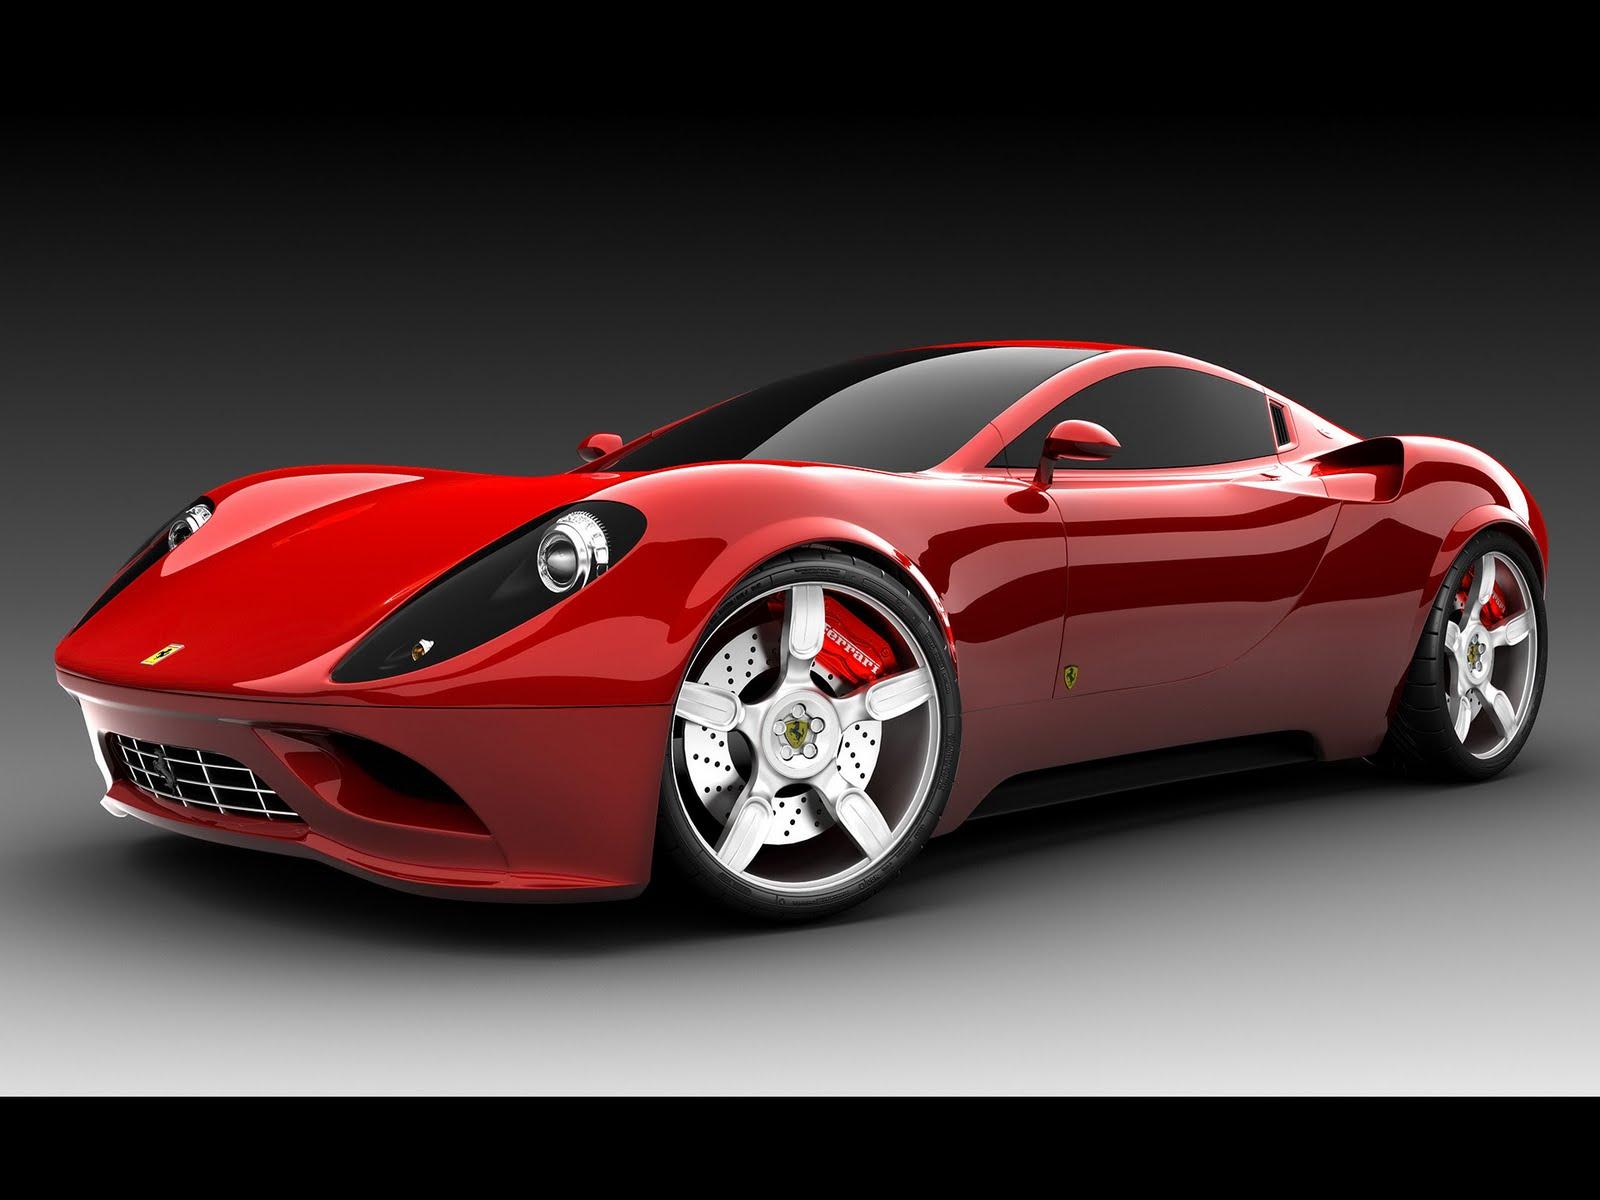 http://2.bp.blogspot.com/-1fU6pORm3MA/Tkta44rK1JI/AAAAAAAAACE/y5iAHrcFpOg/s1600/Ferrari-wallpaper-2.jpg